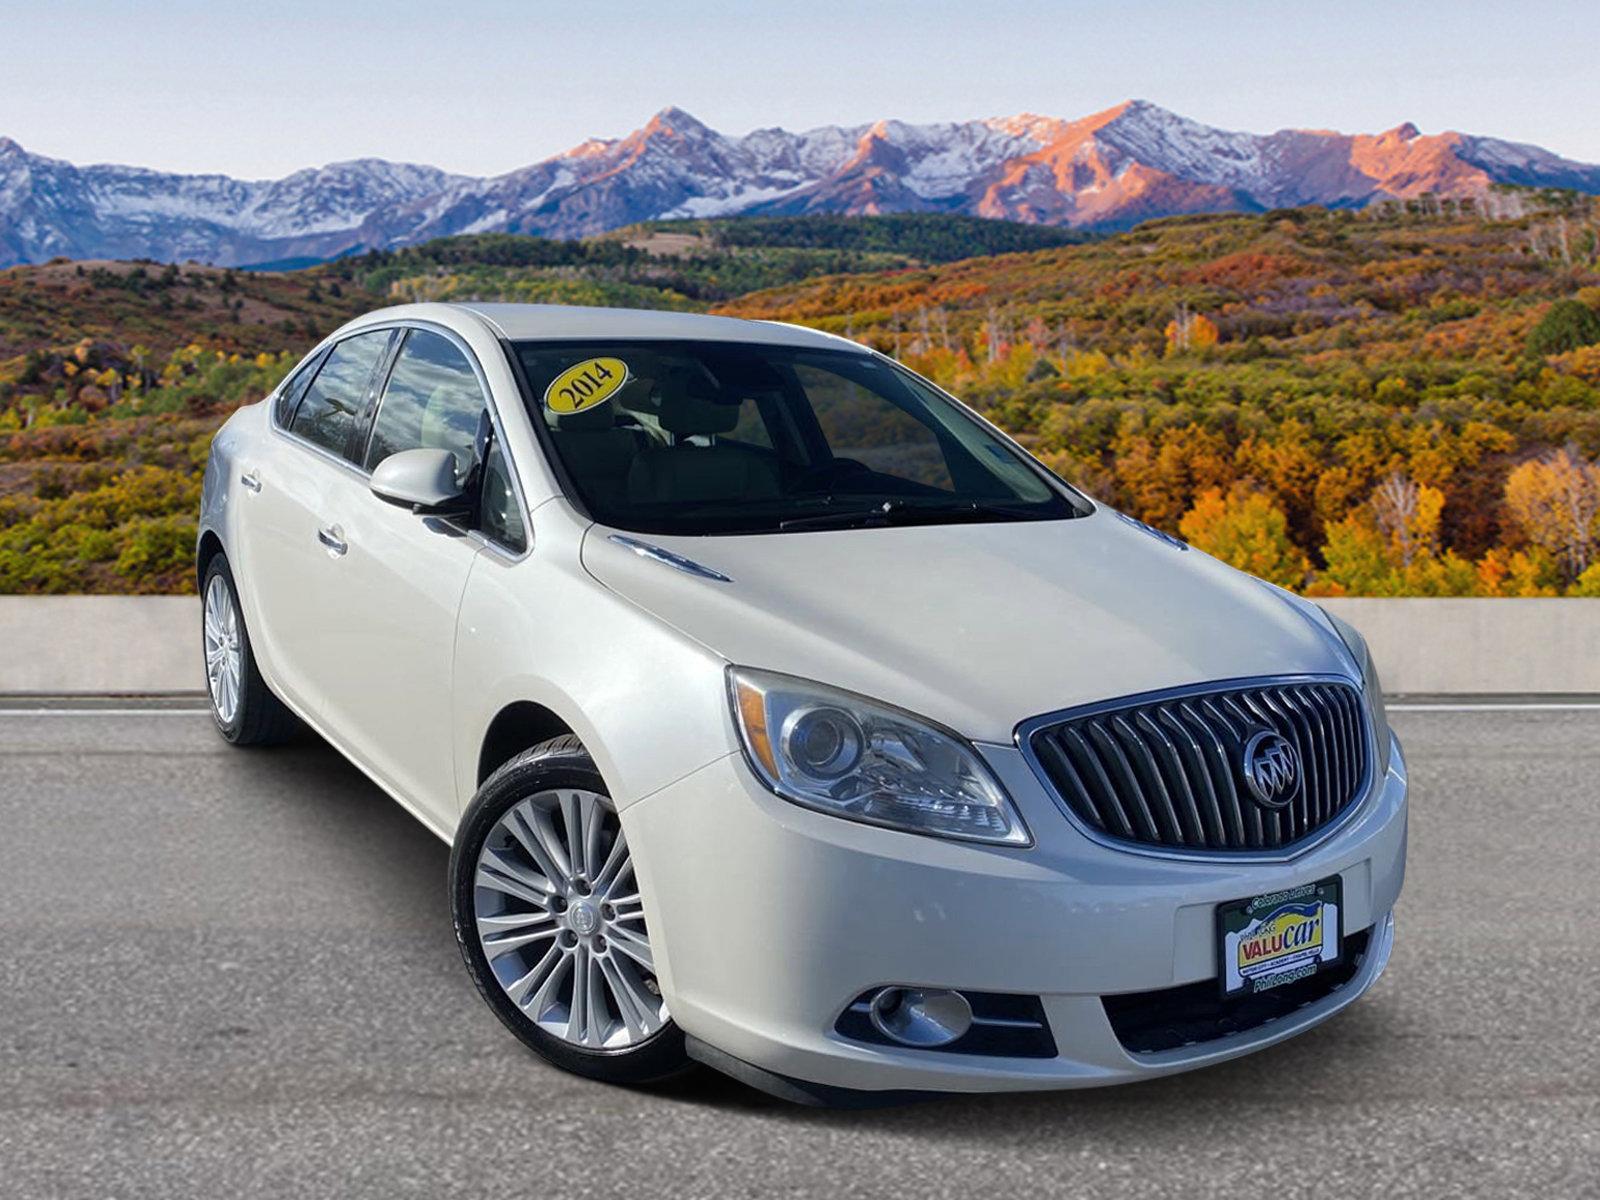 2014 Buick Verano  image